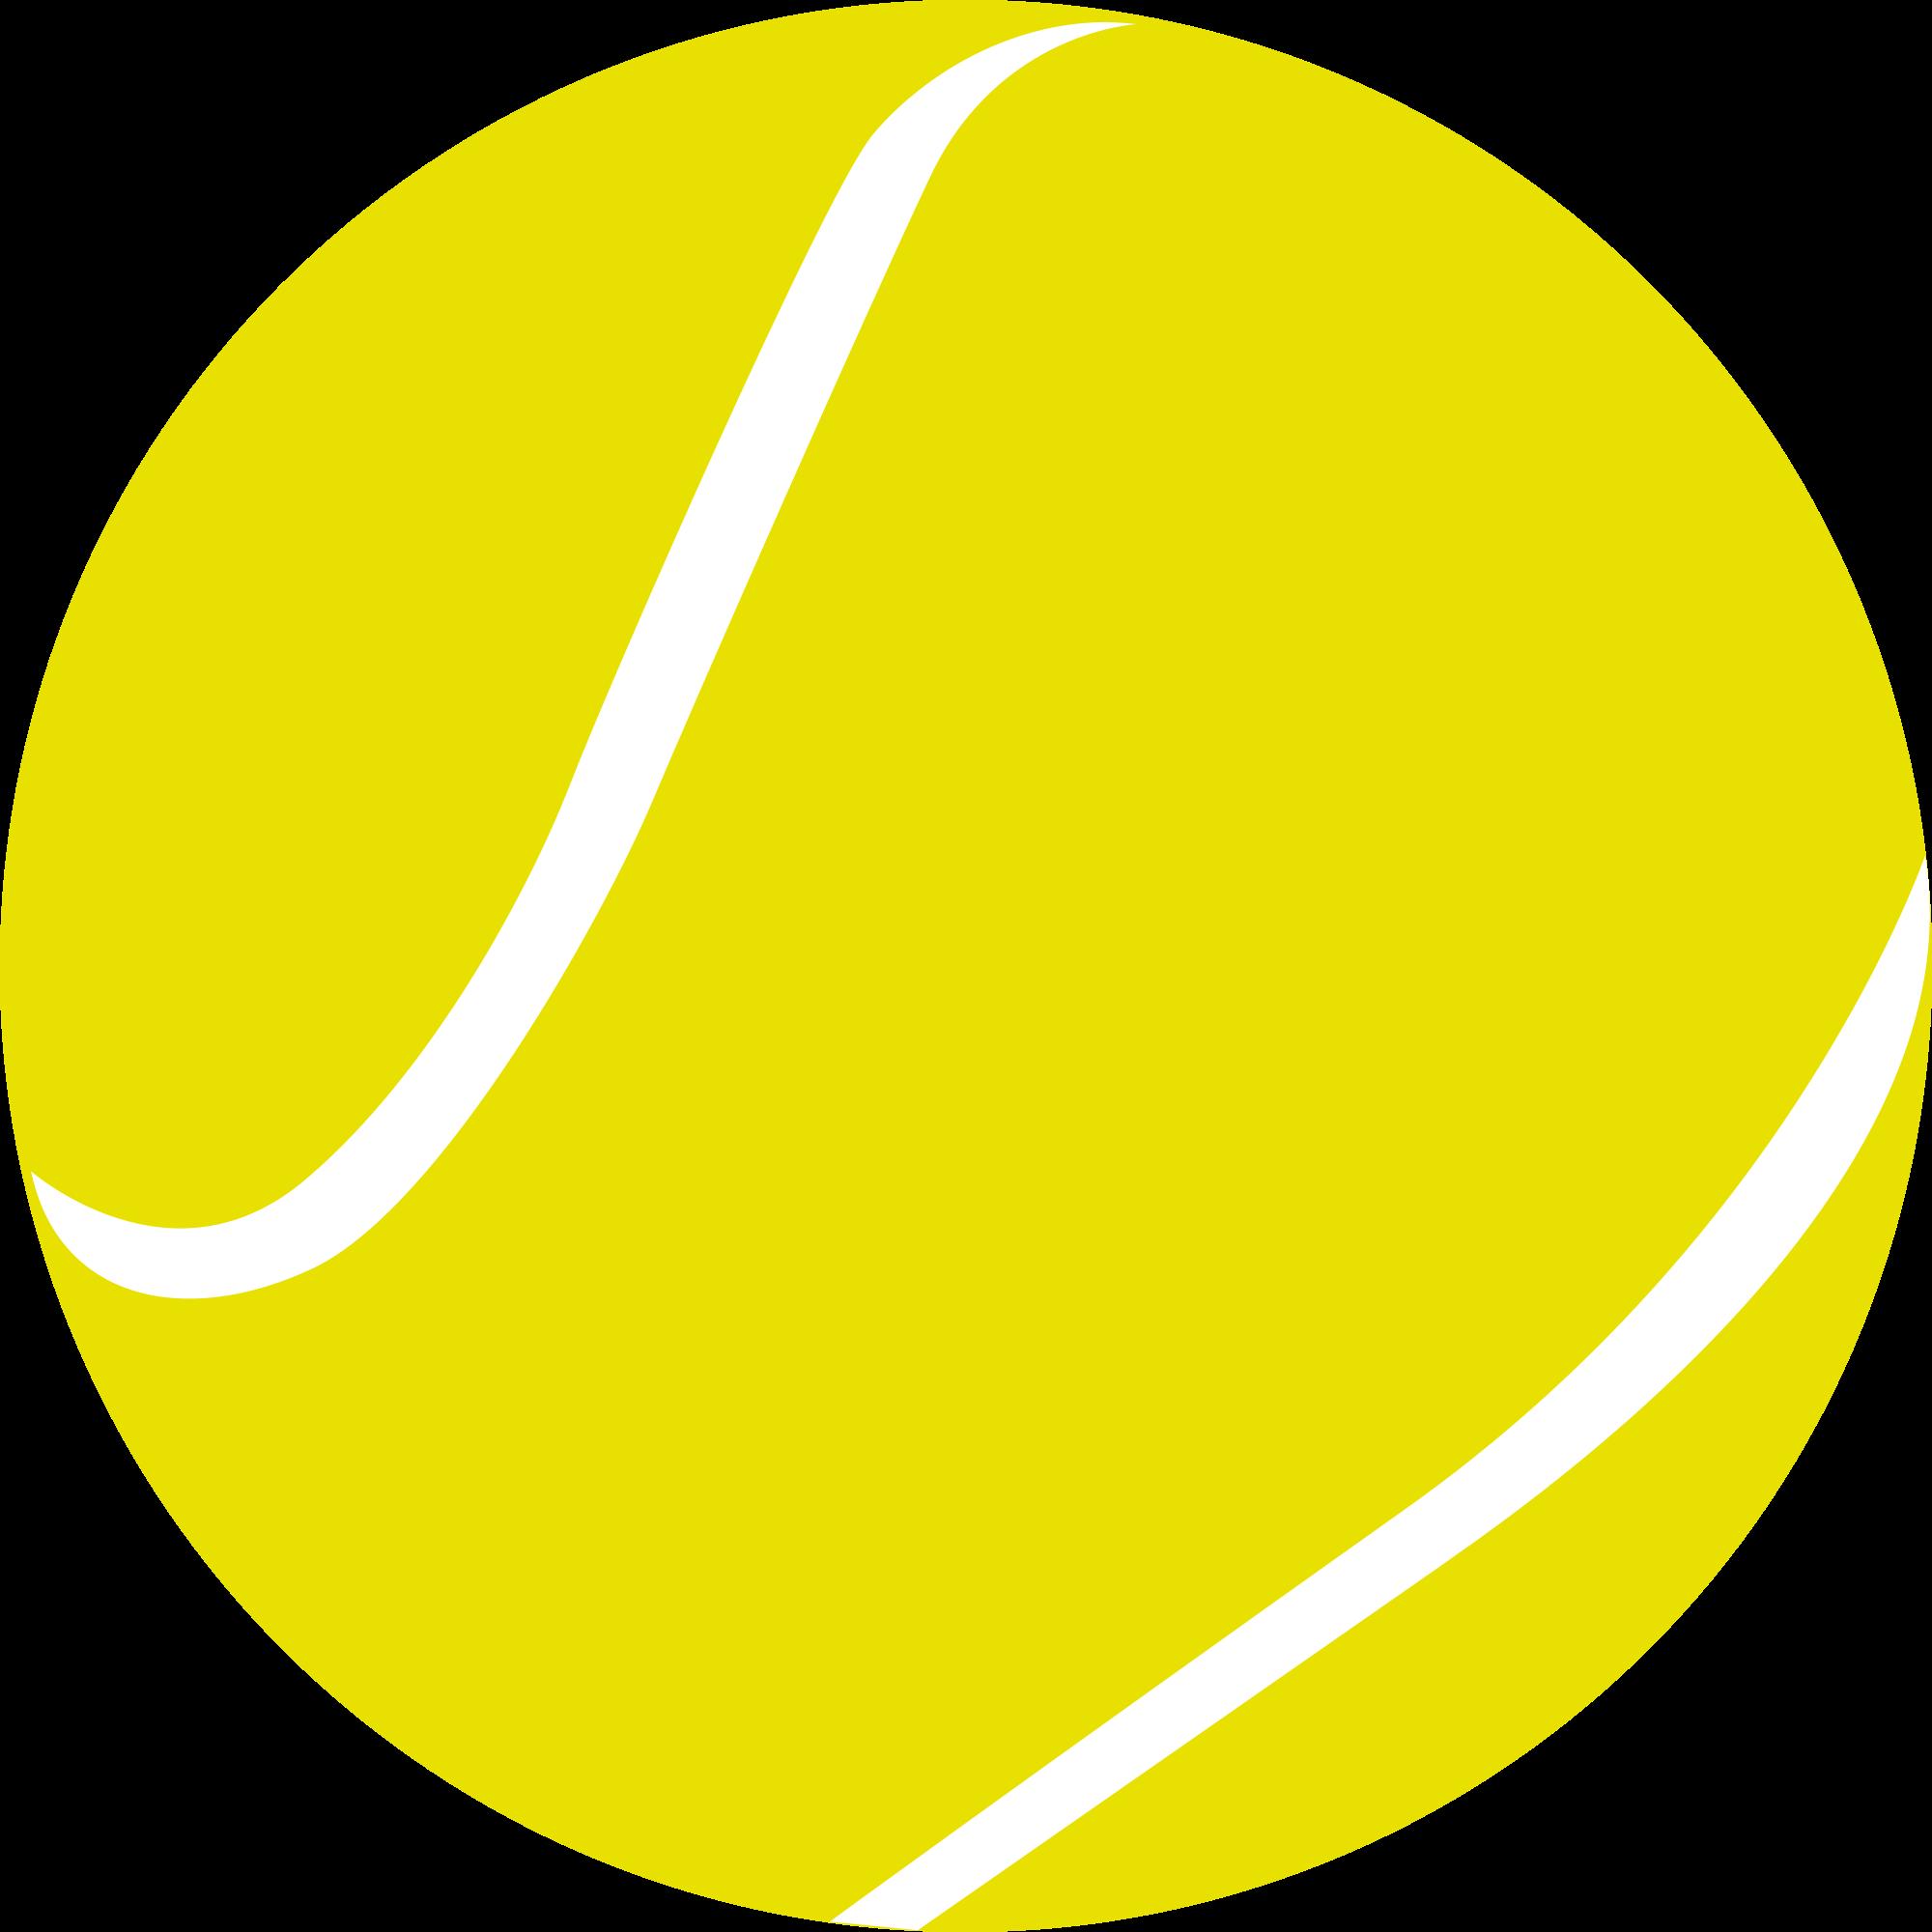 tennis ball clipart photos 15681 transparentpng rh transparentpng com tennis ball clip art free tennis ball clipart no background